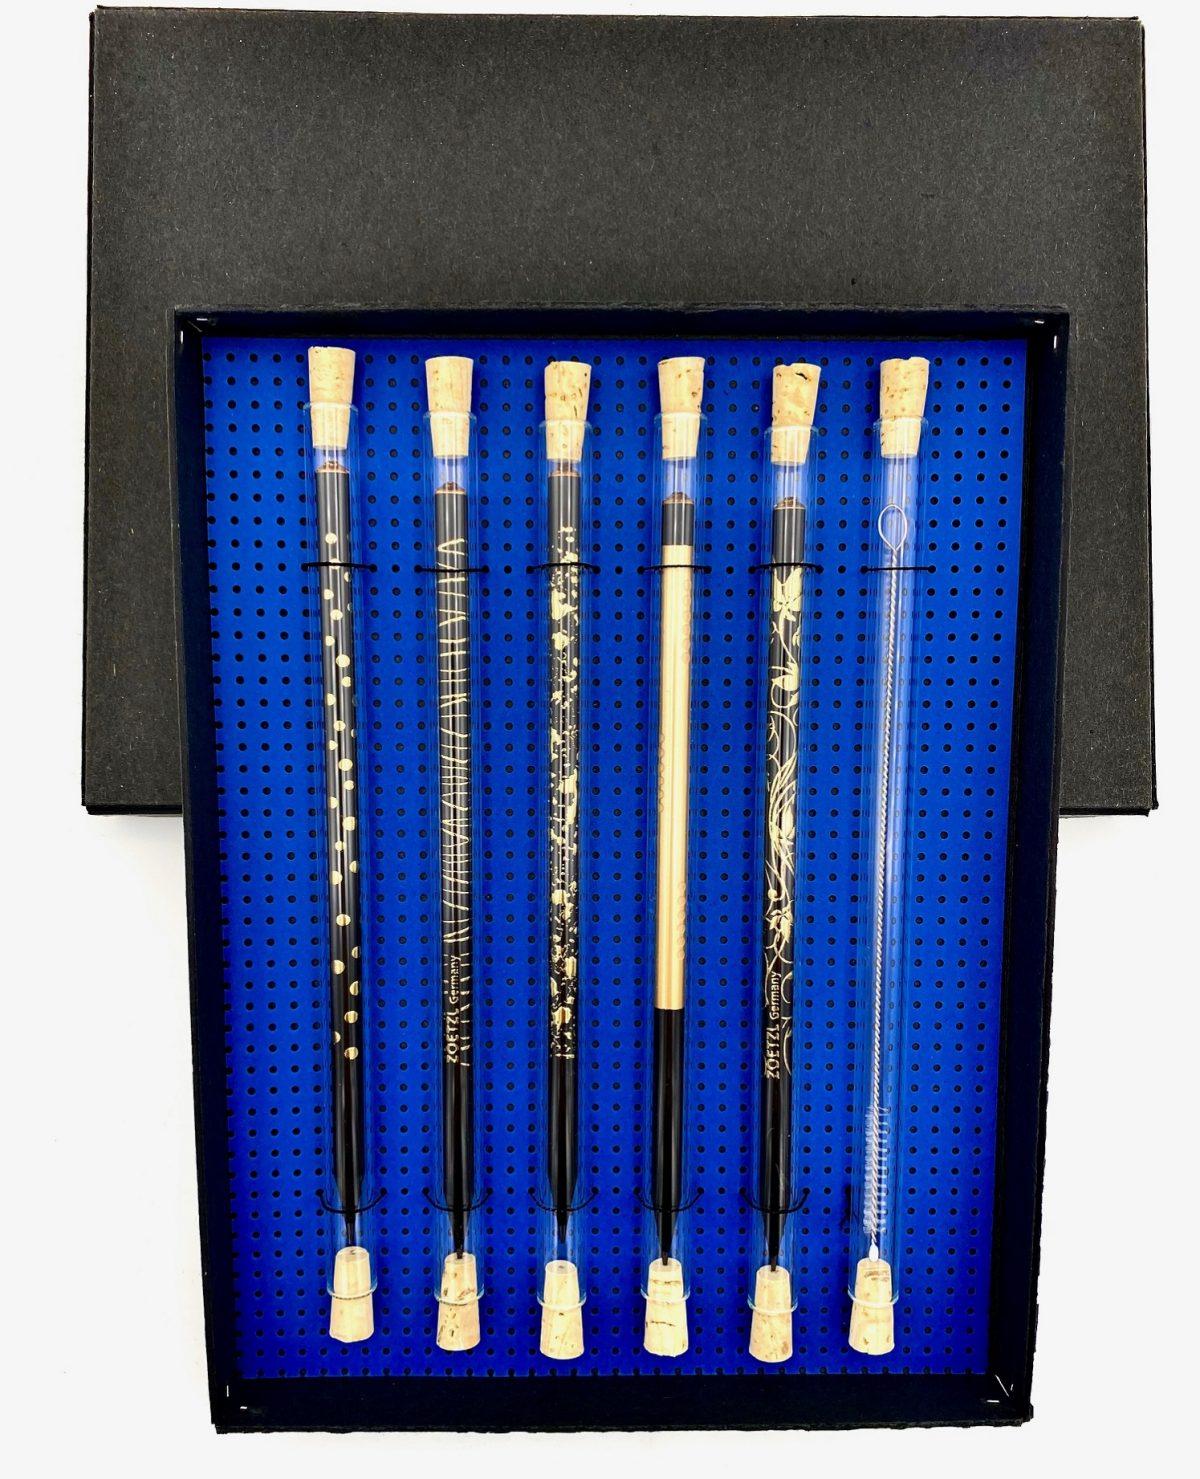 GS107-P  -  Set Trinkhalm & Pencil & Cleaner, Black & Gold